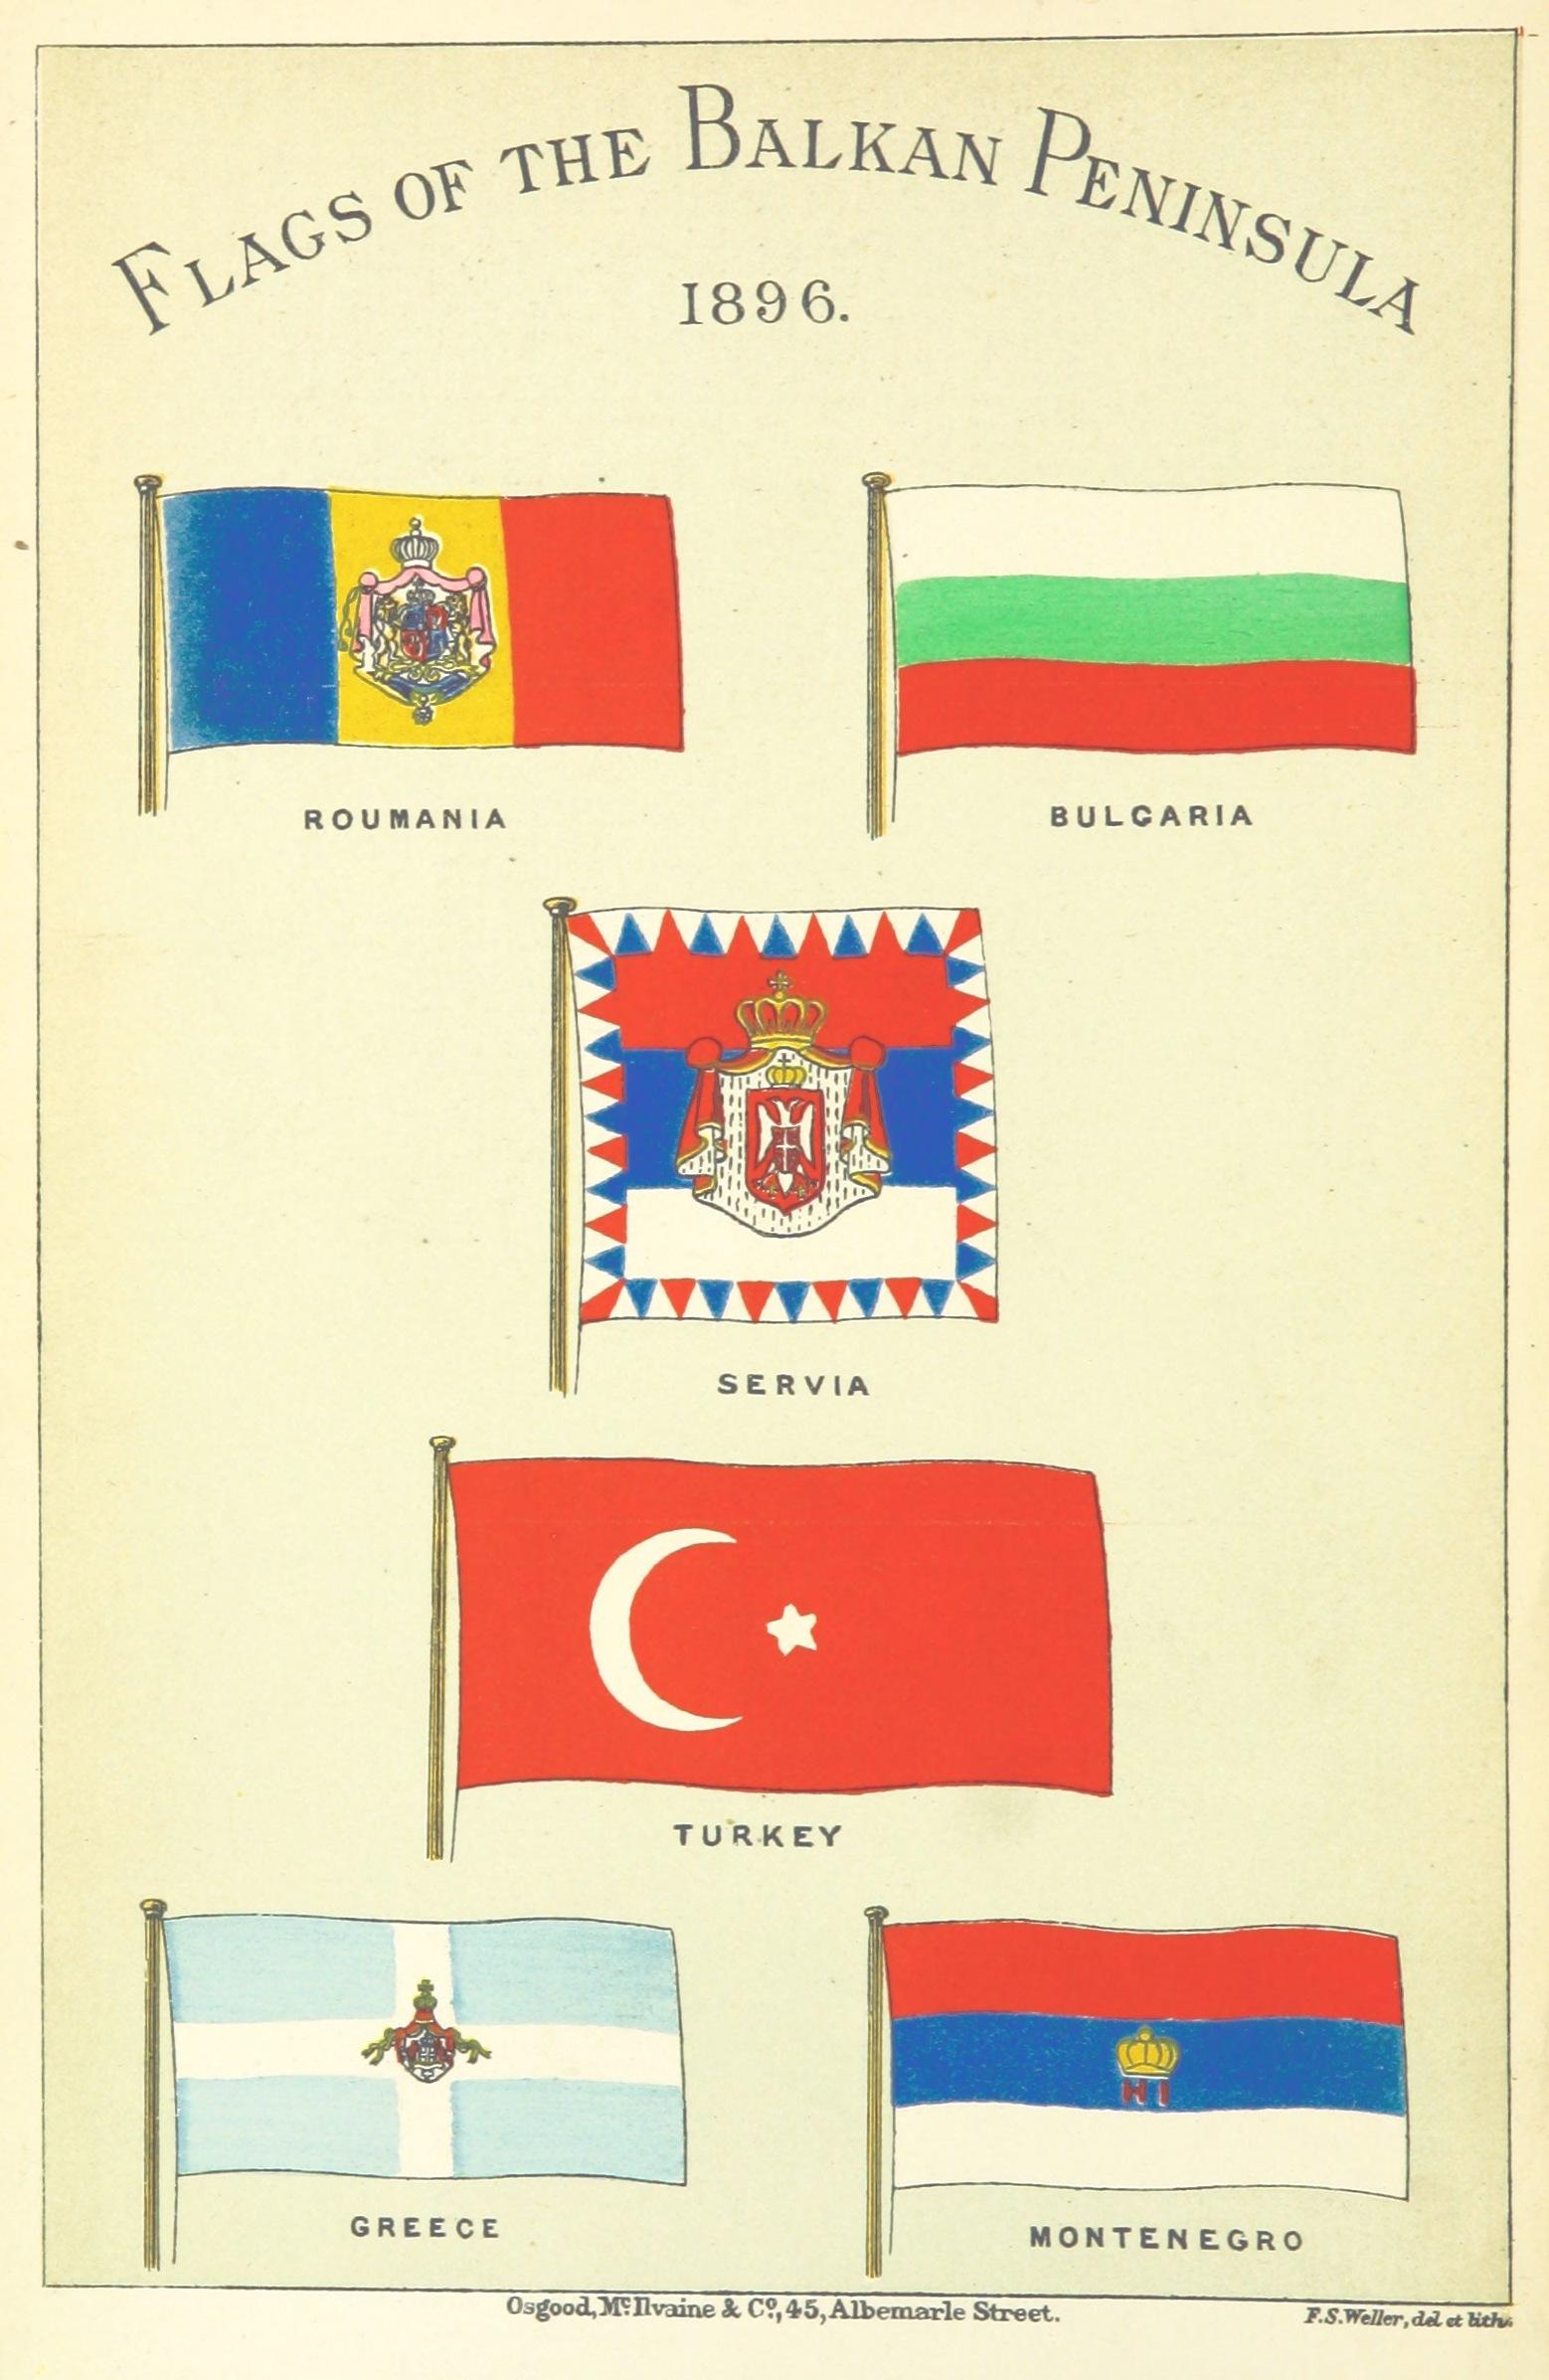 Flags of the Balkan Peninsula 1896 : vexillology